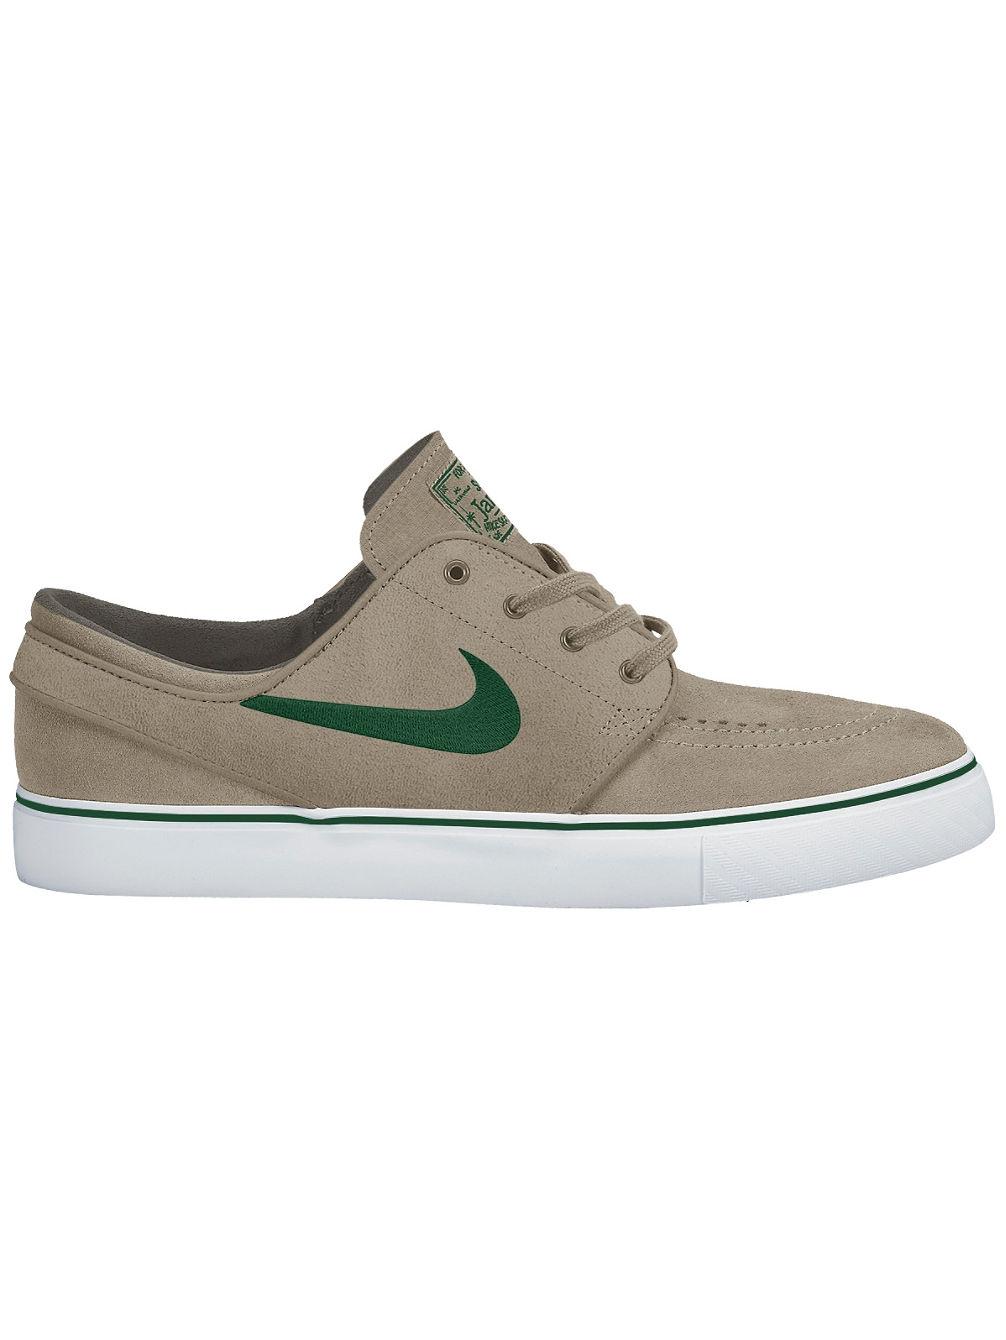 Nike Zoom Stefan Janoski Skate Shoes - nike - blue-tomato.com